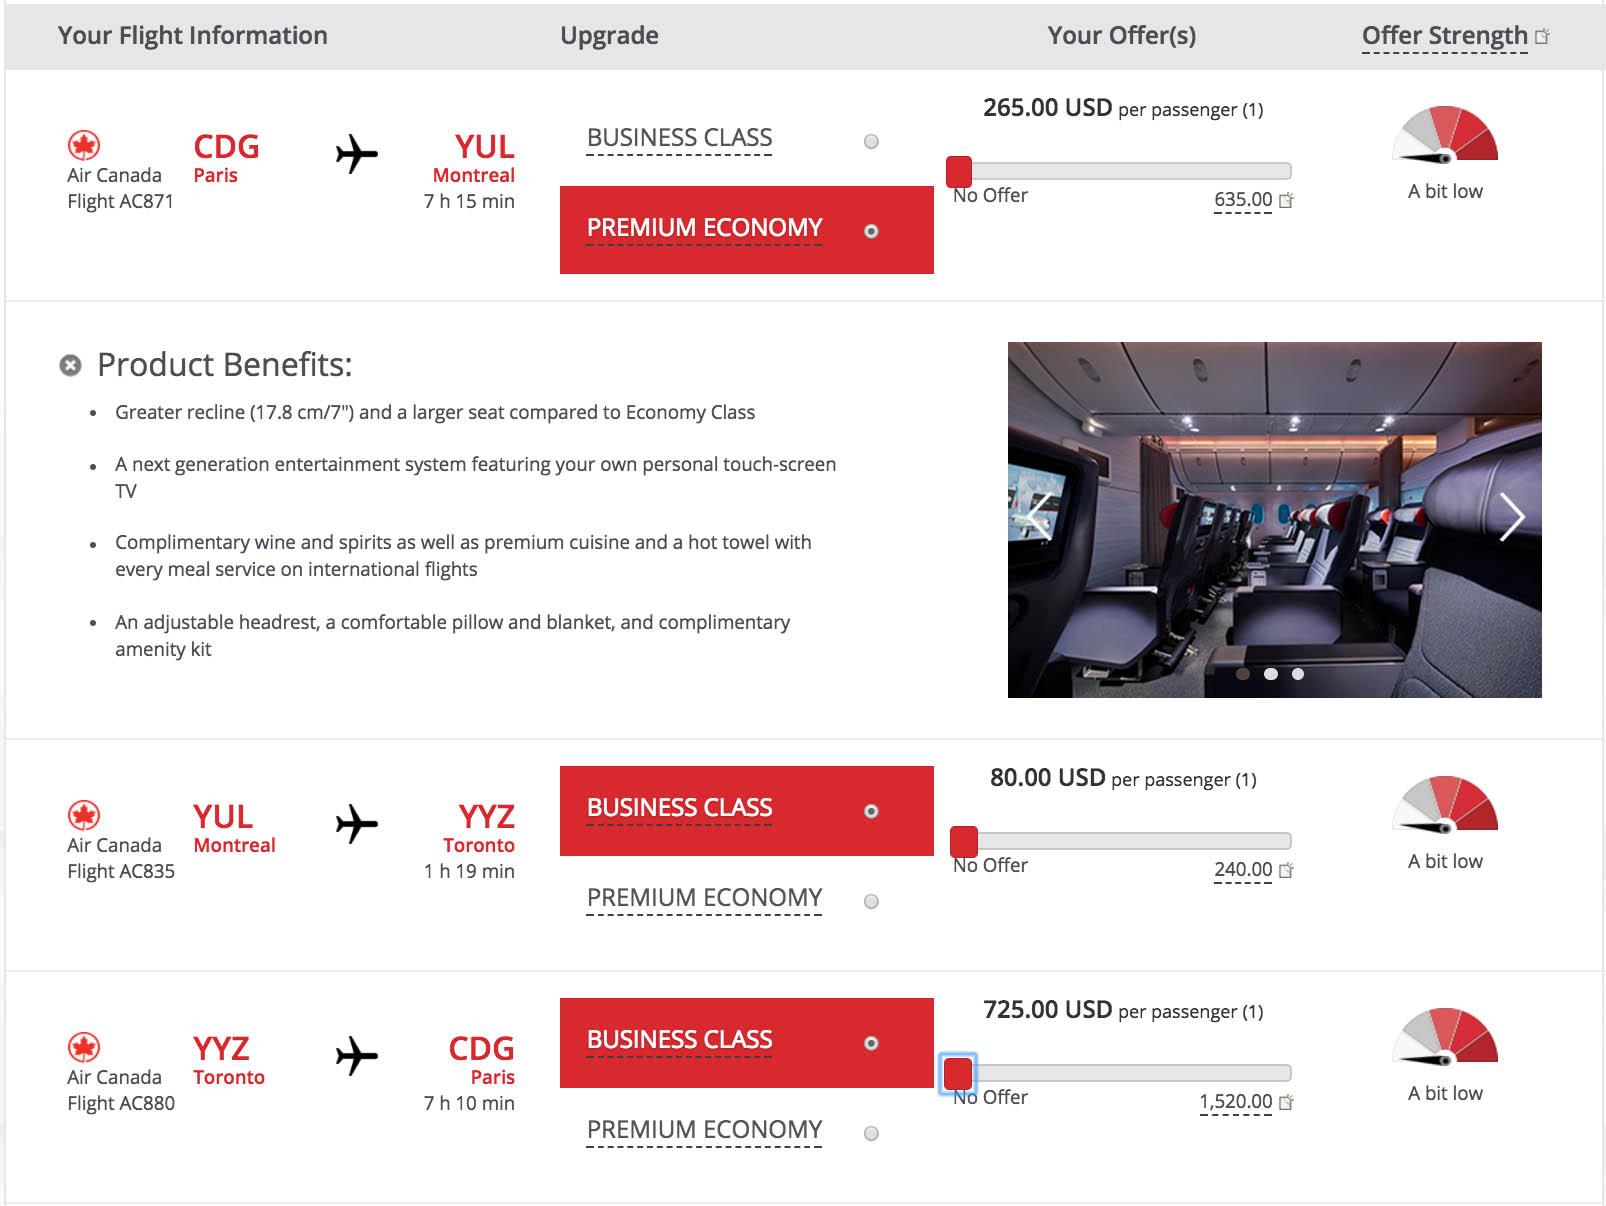 Air Canada Upgrade Bid